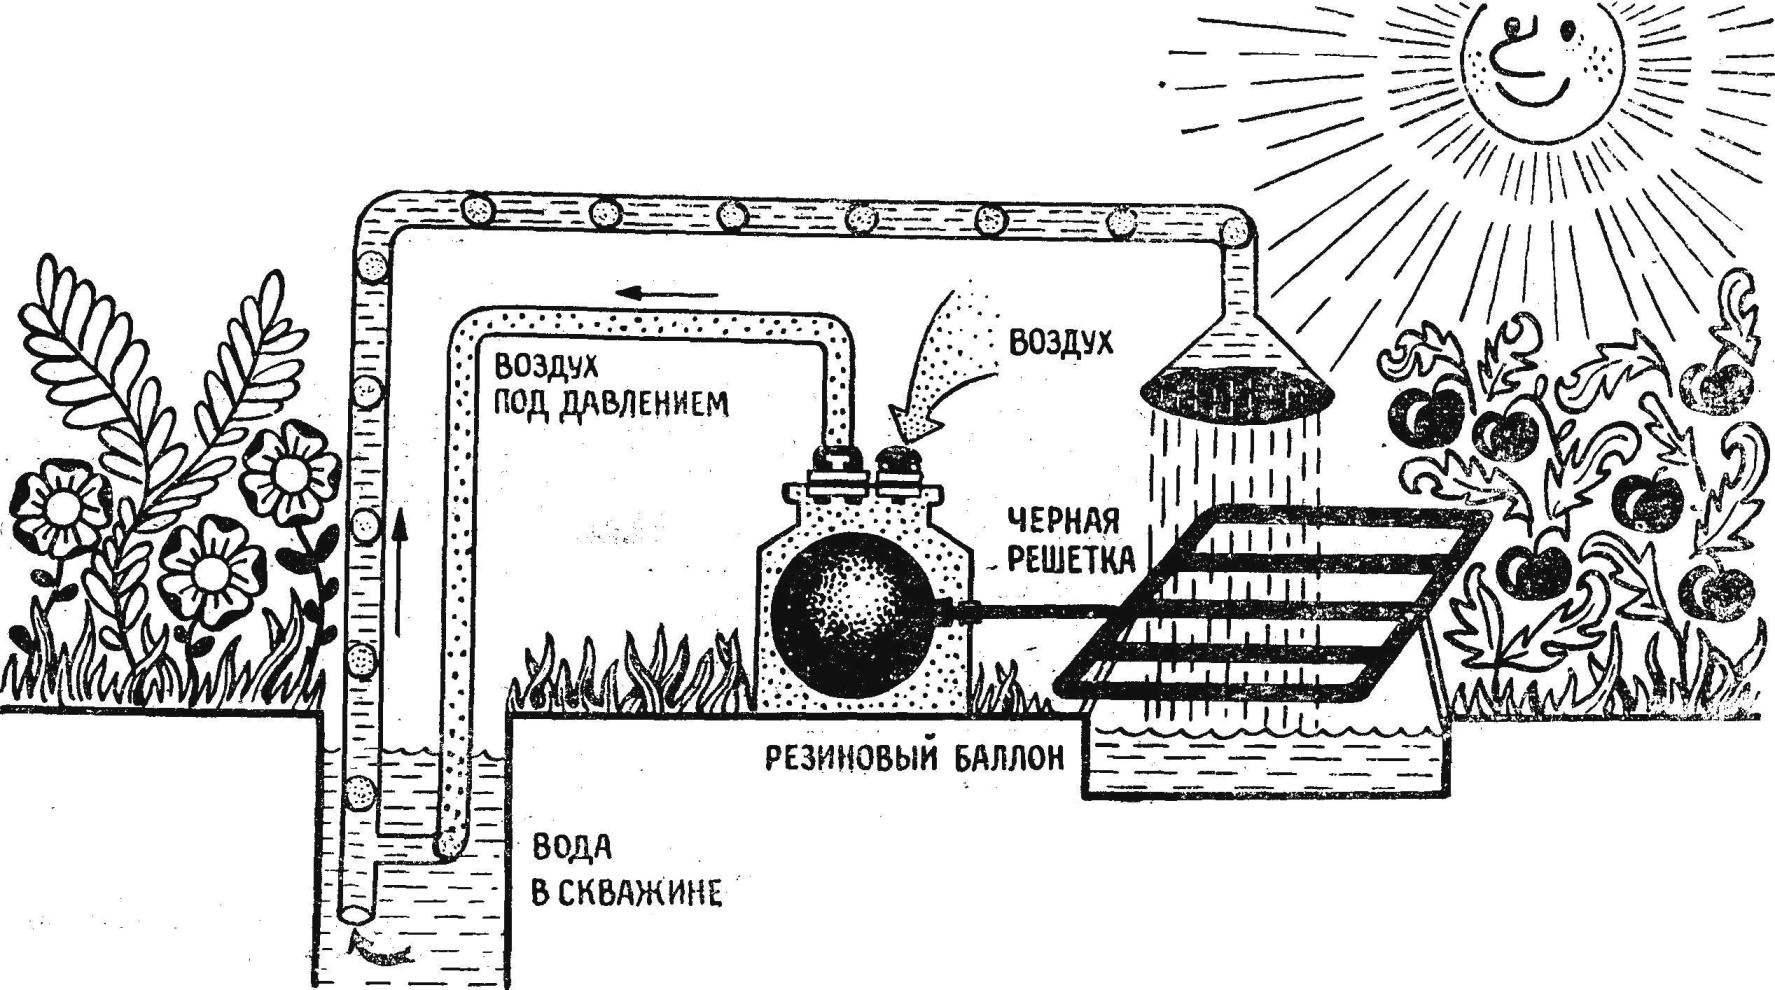 Рис. 1. Схема водоподъемника П. Радченко.